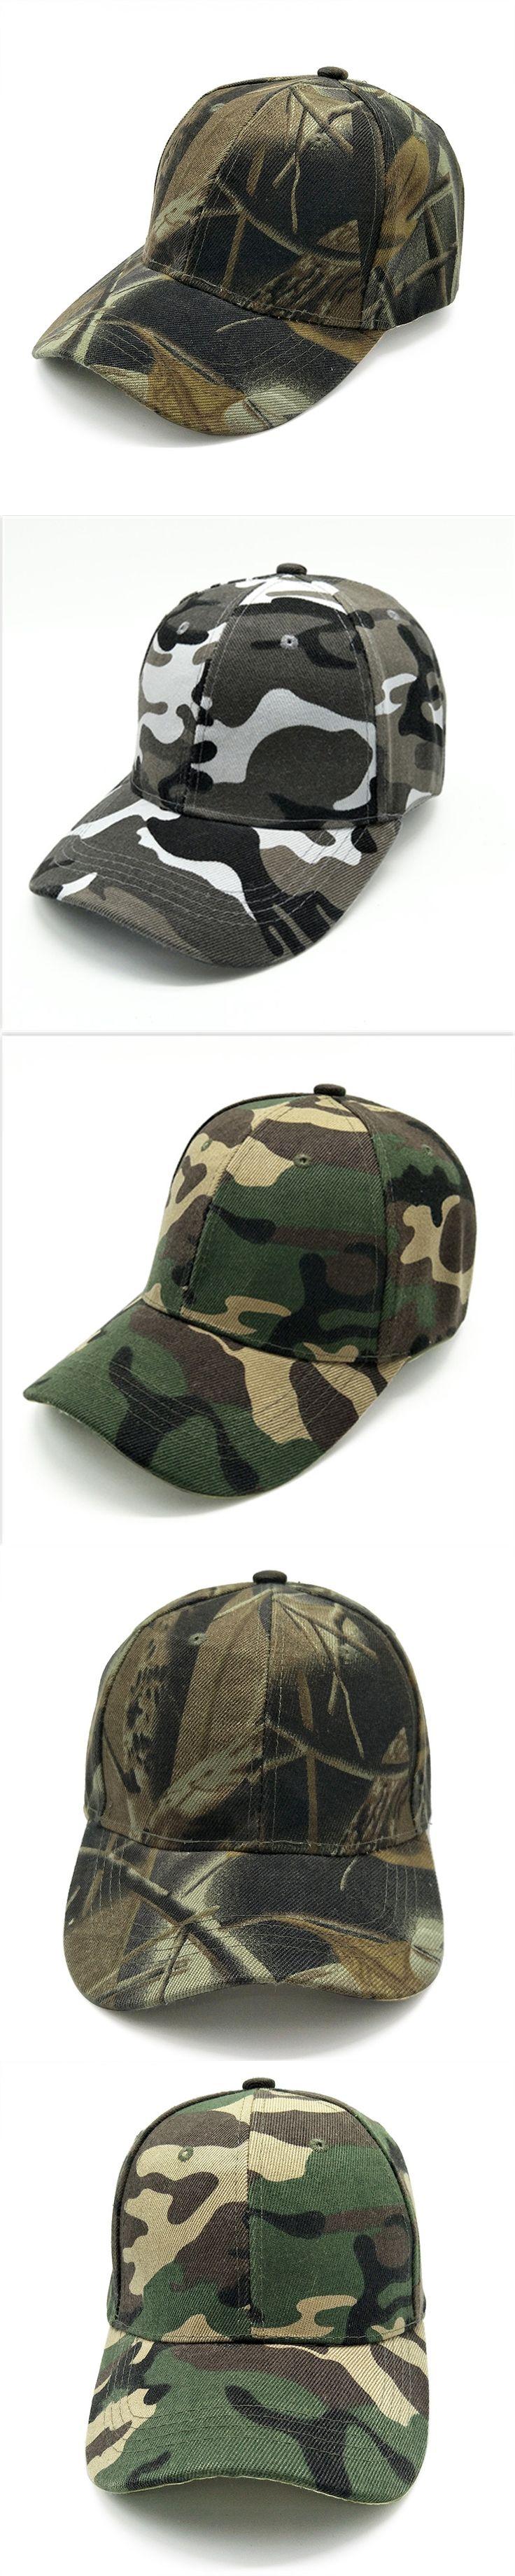 Cotton Army Caps Tactical Camouflage Hats Baseball Hats For Men Outdoor Sun Hat Sport Cap Bone casquette homme Males Caps